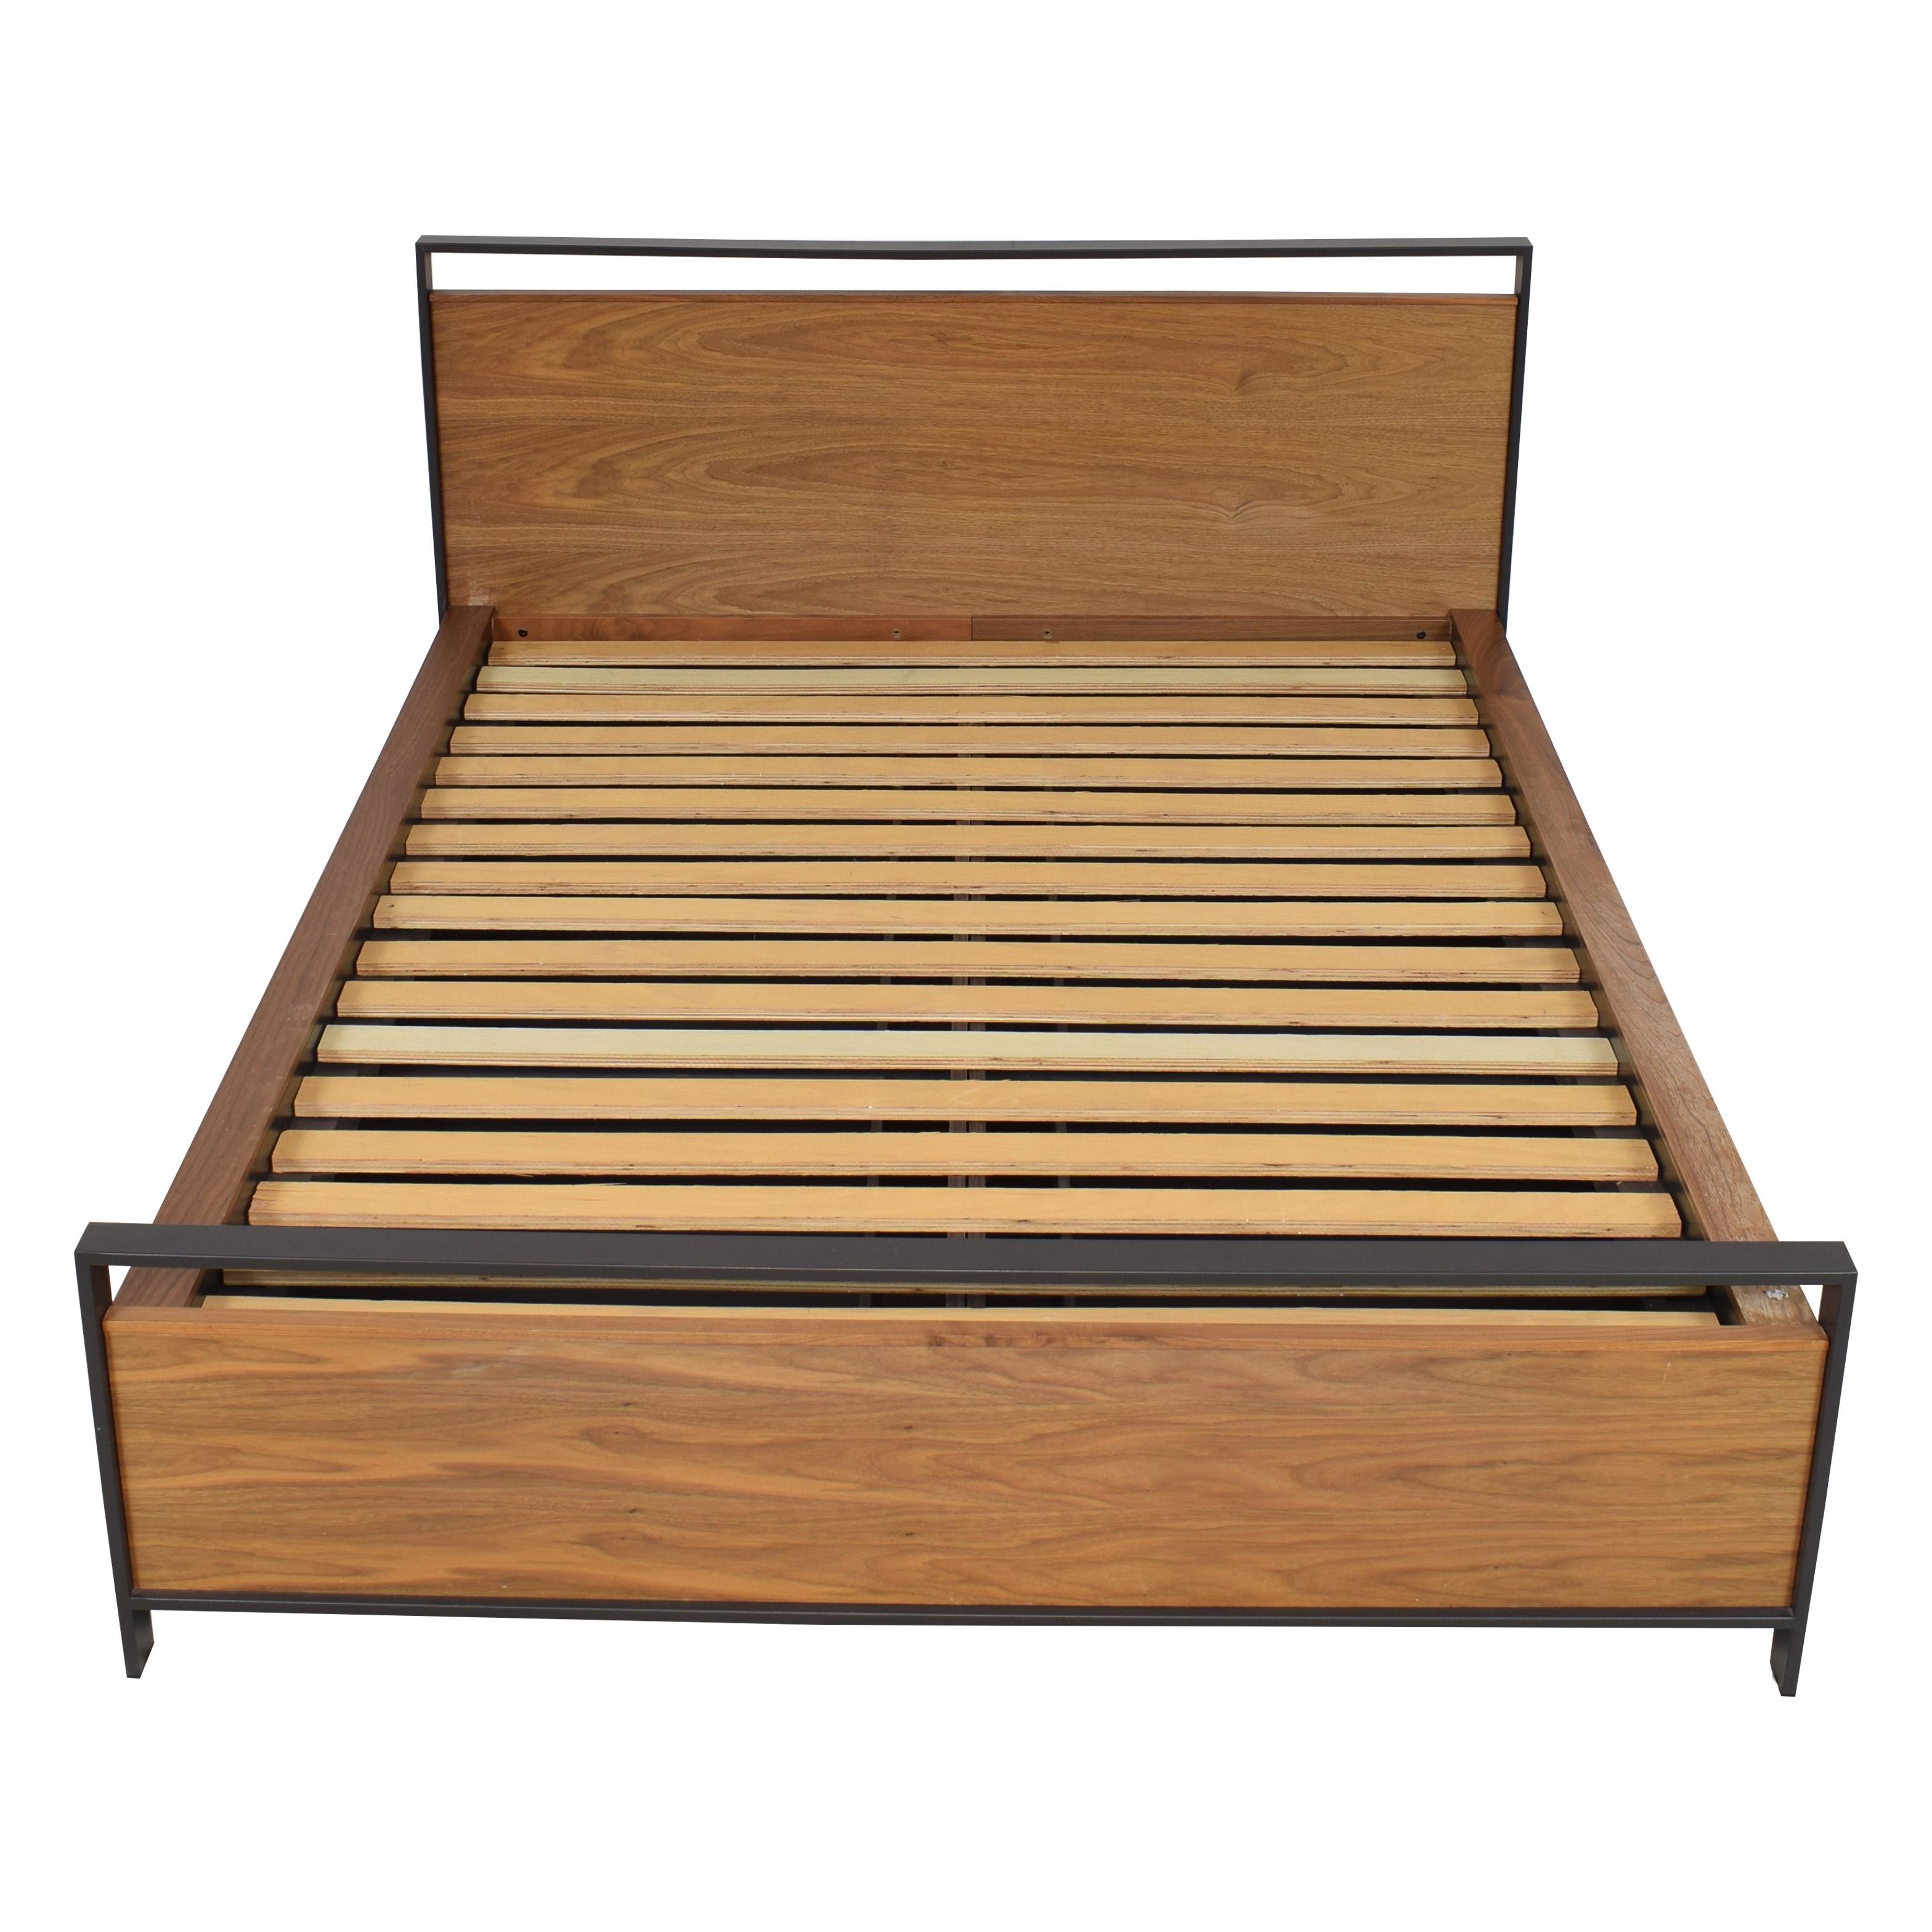 Crate & Barrel Crate & Barrel Queen Storage Bed nyc